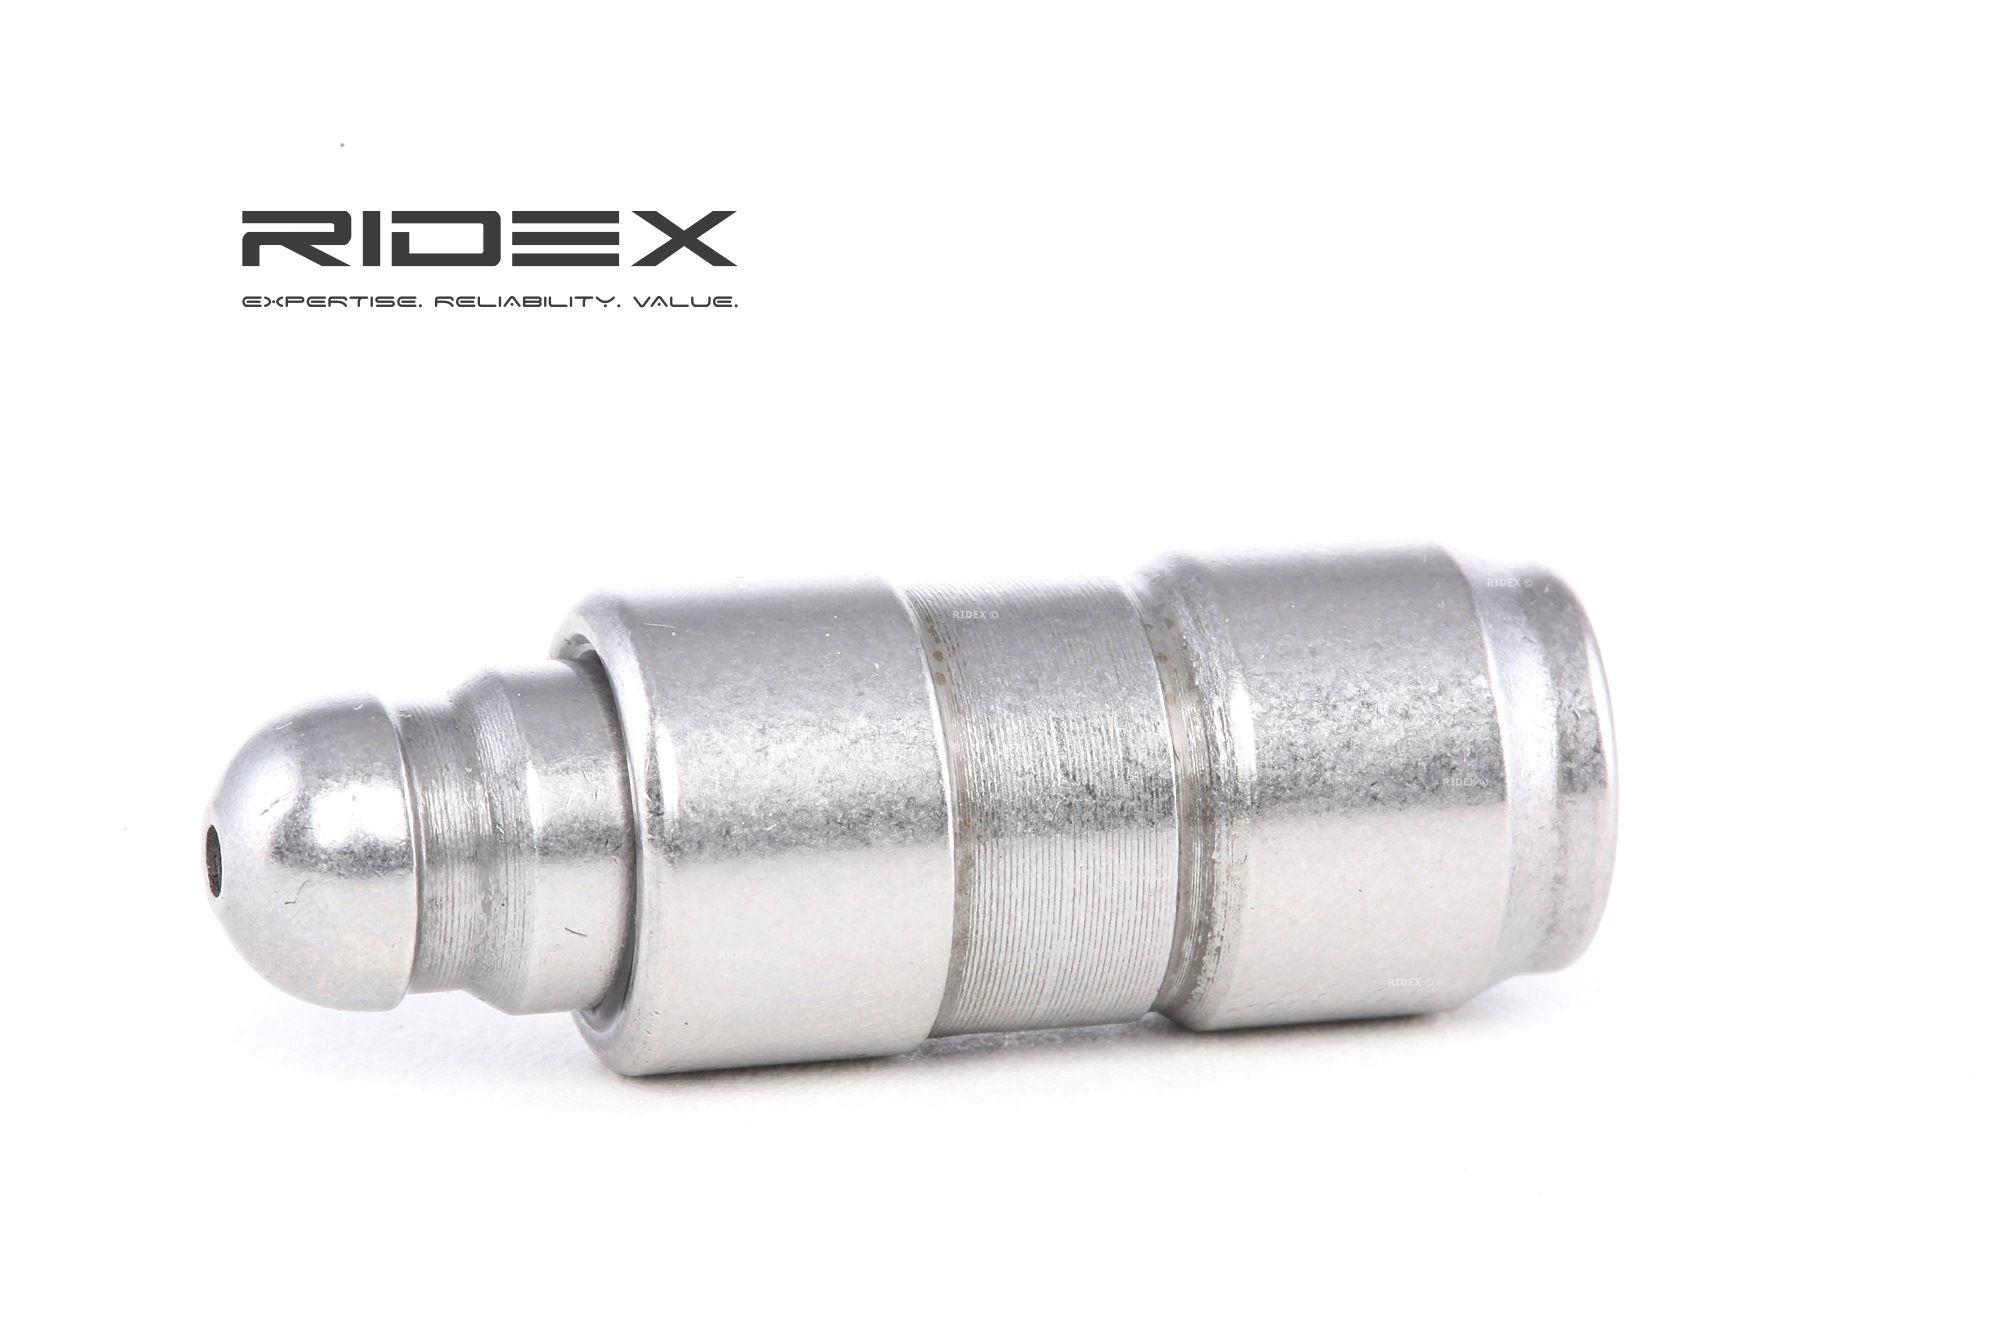 Stößel RIDEX 1216R0024 Bewertung